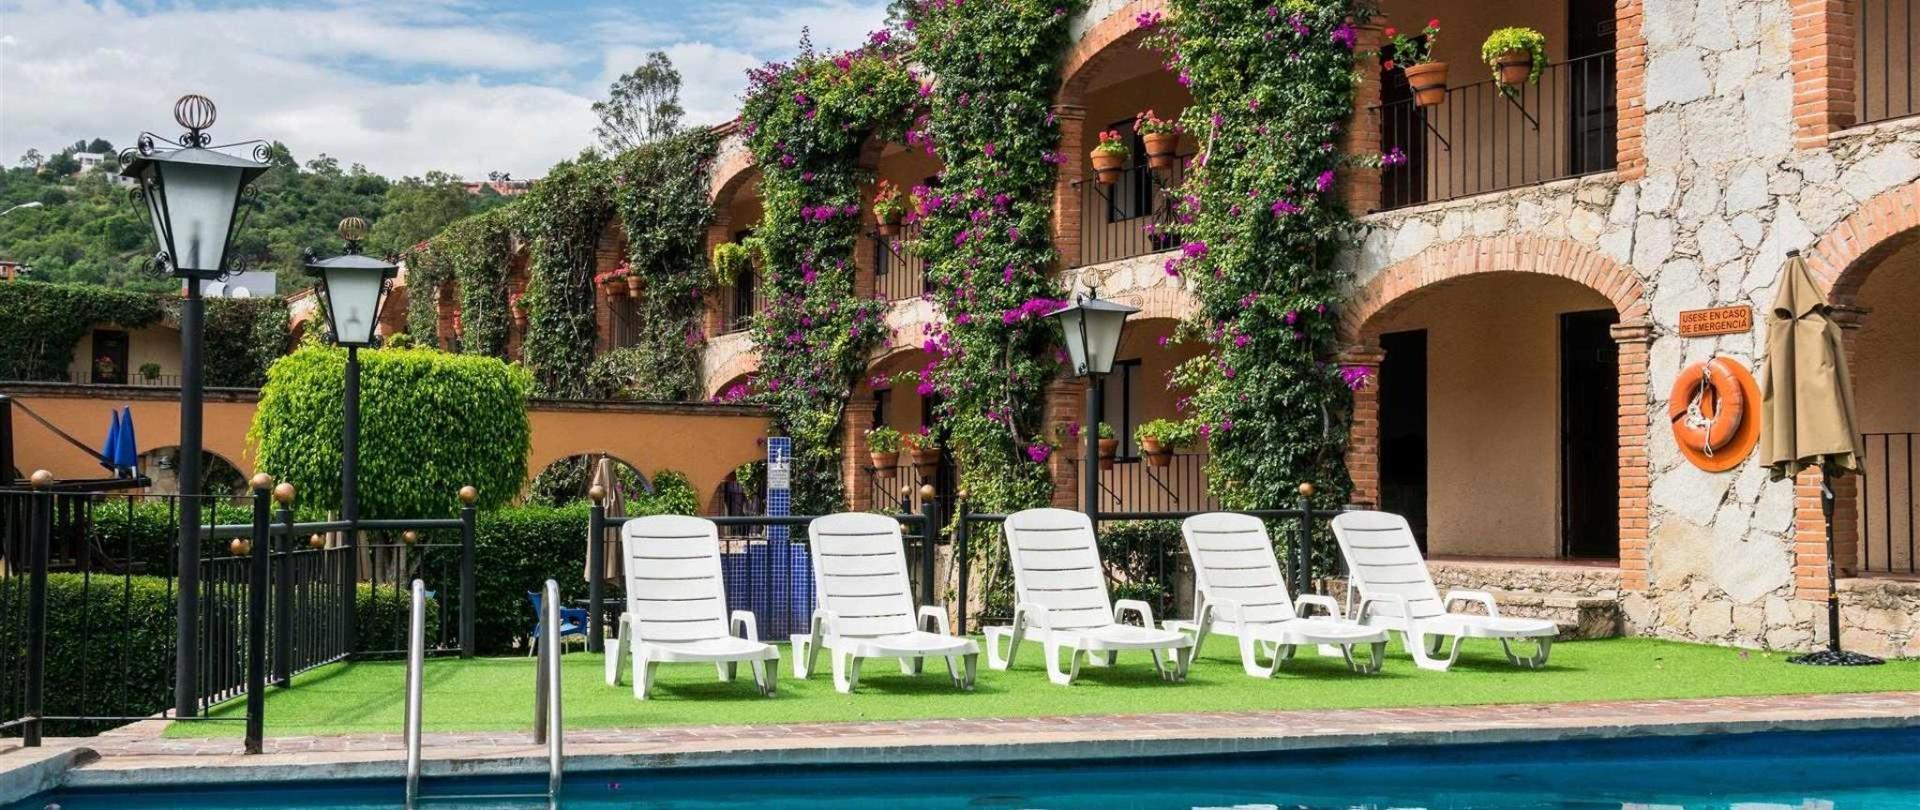 homepage-la-abadia-hotel-guanajuato-mexico5.jpeg